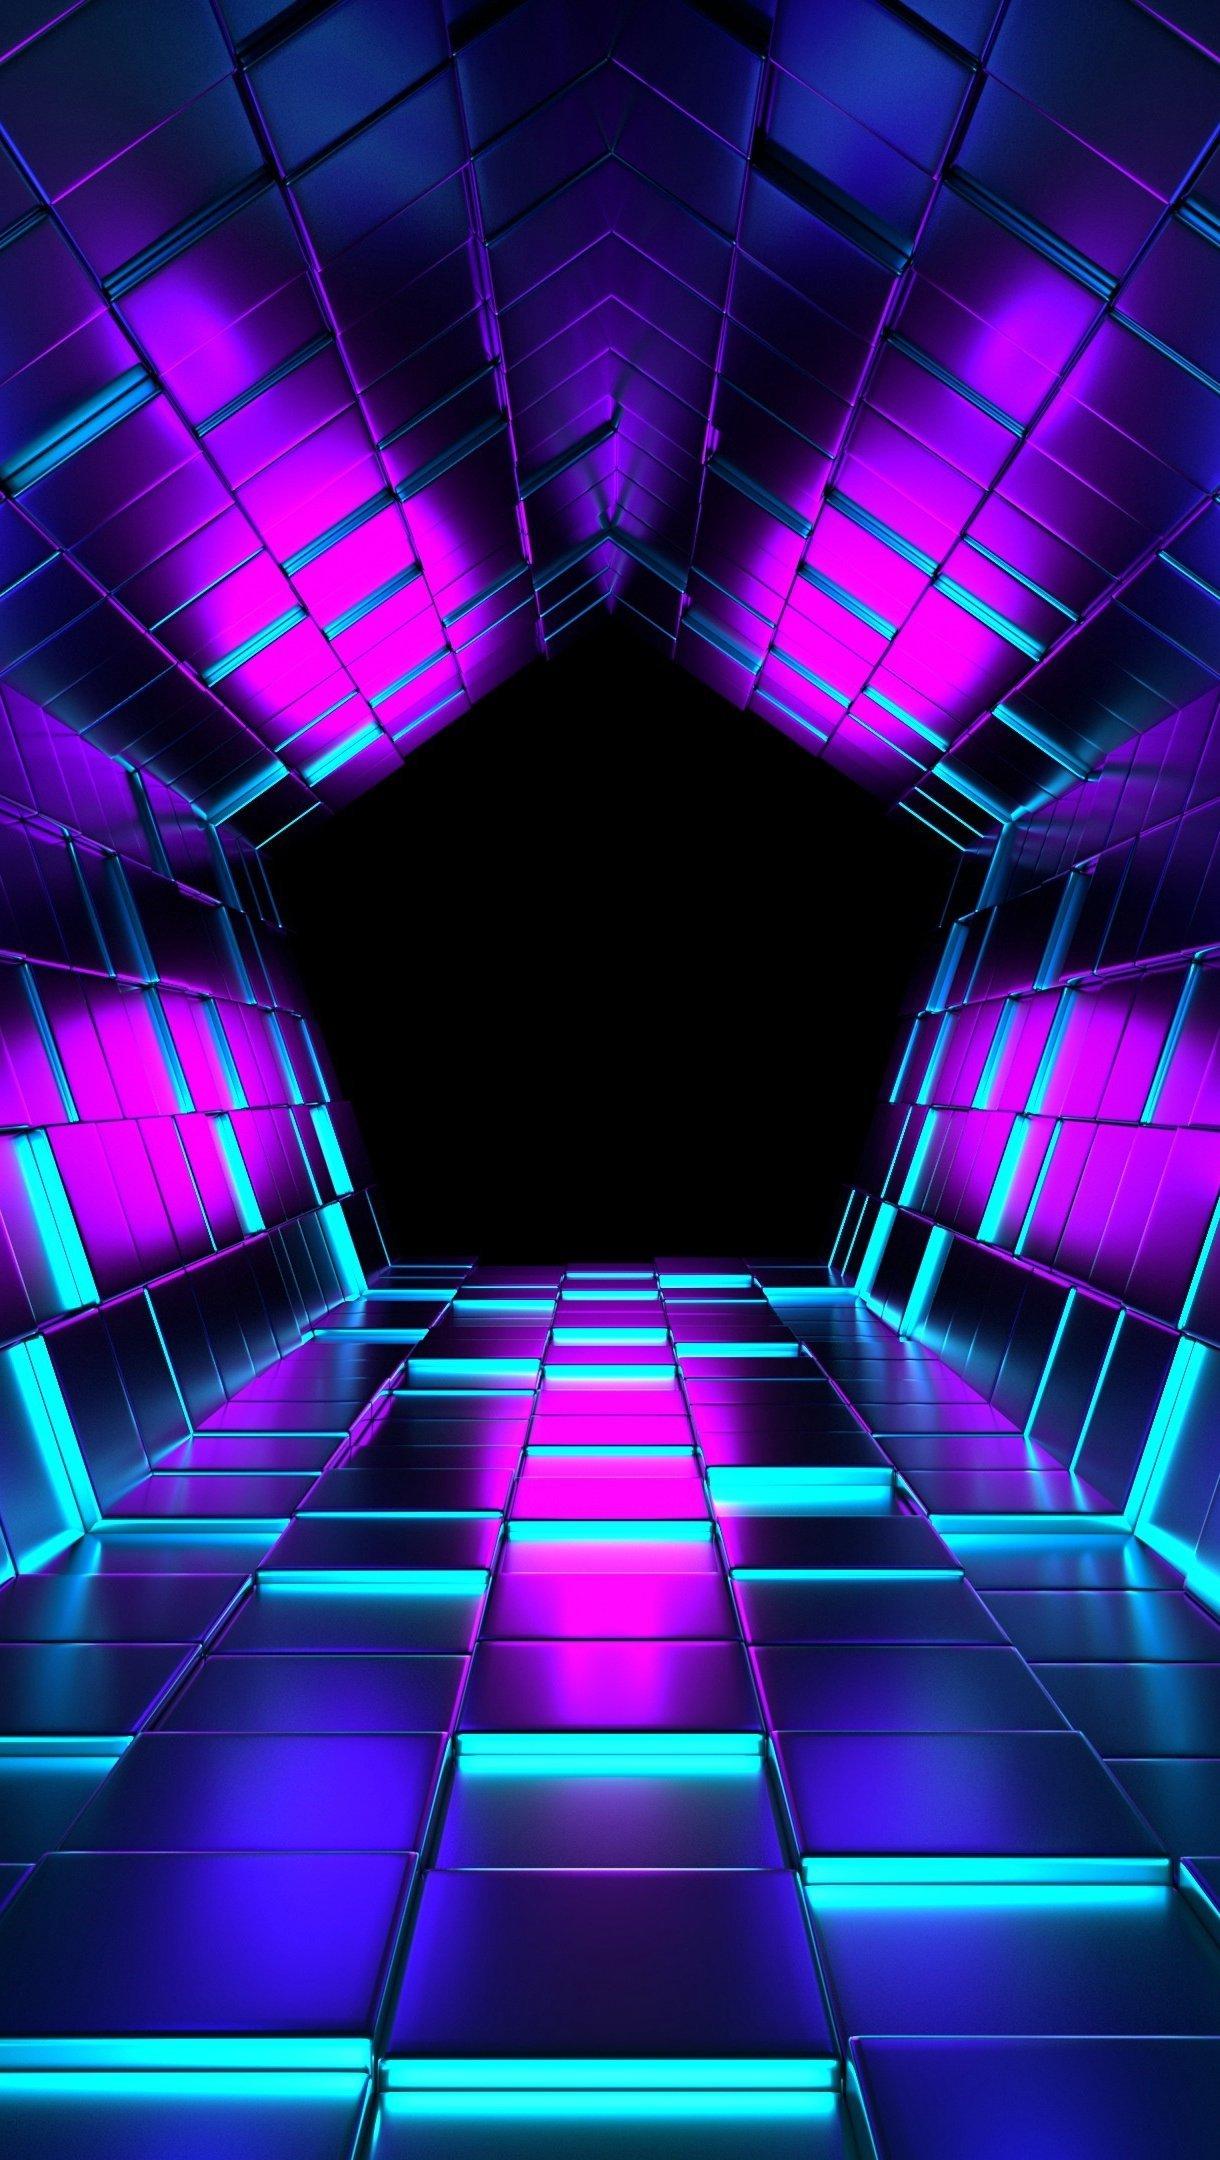 Wallpaper Pentagon tunnel with neón lights Vertical